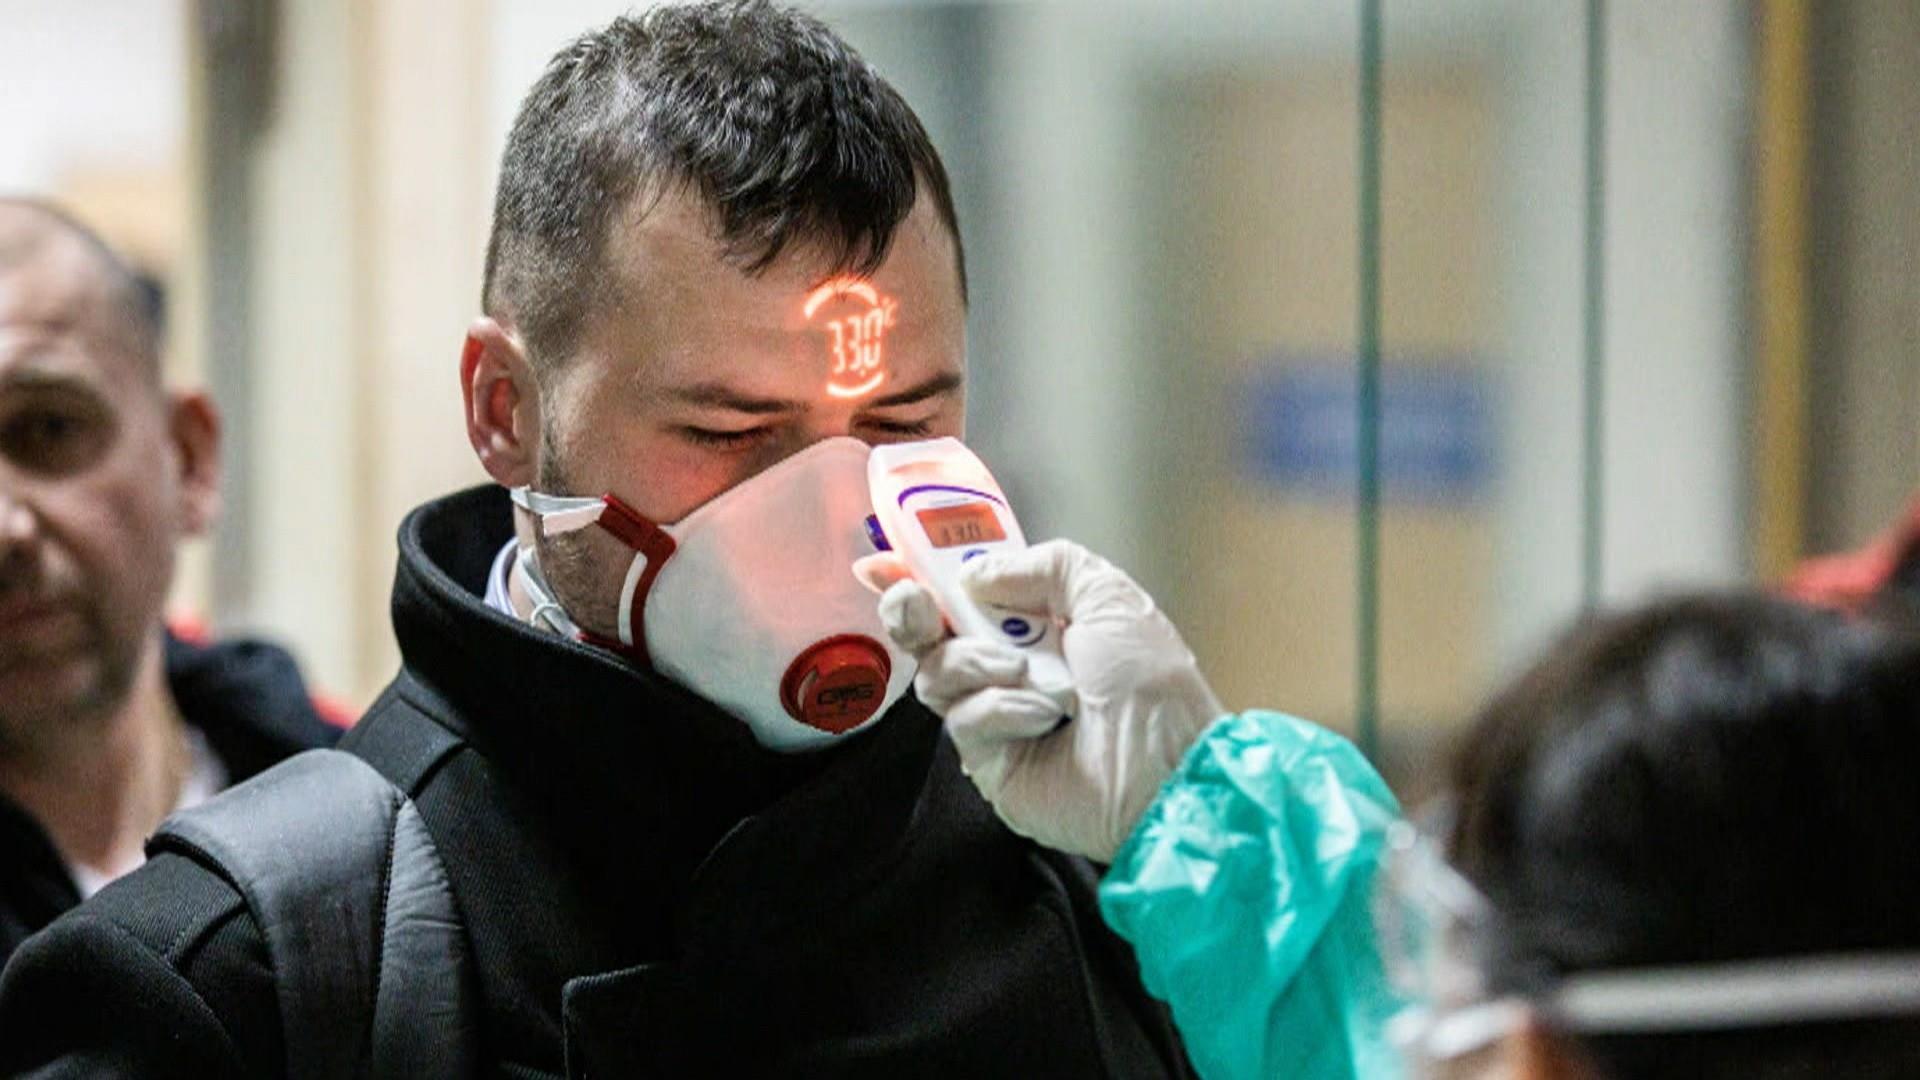 Iran's deputy health minister suffers coronavirus symptoms on live TV